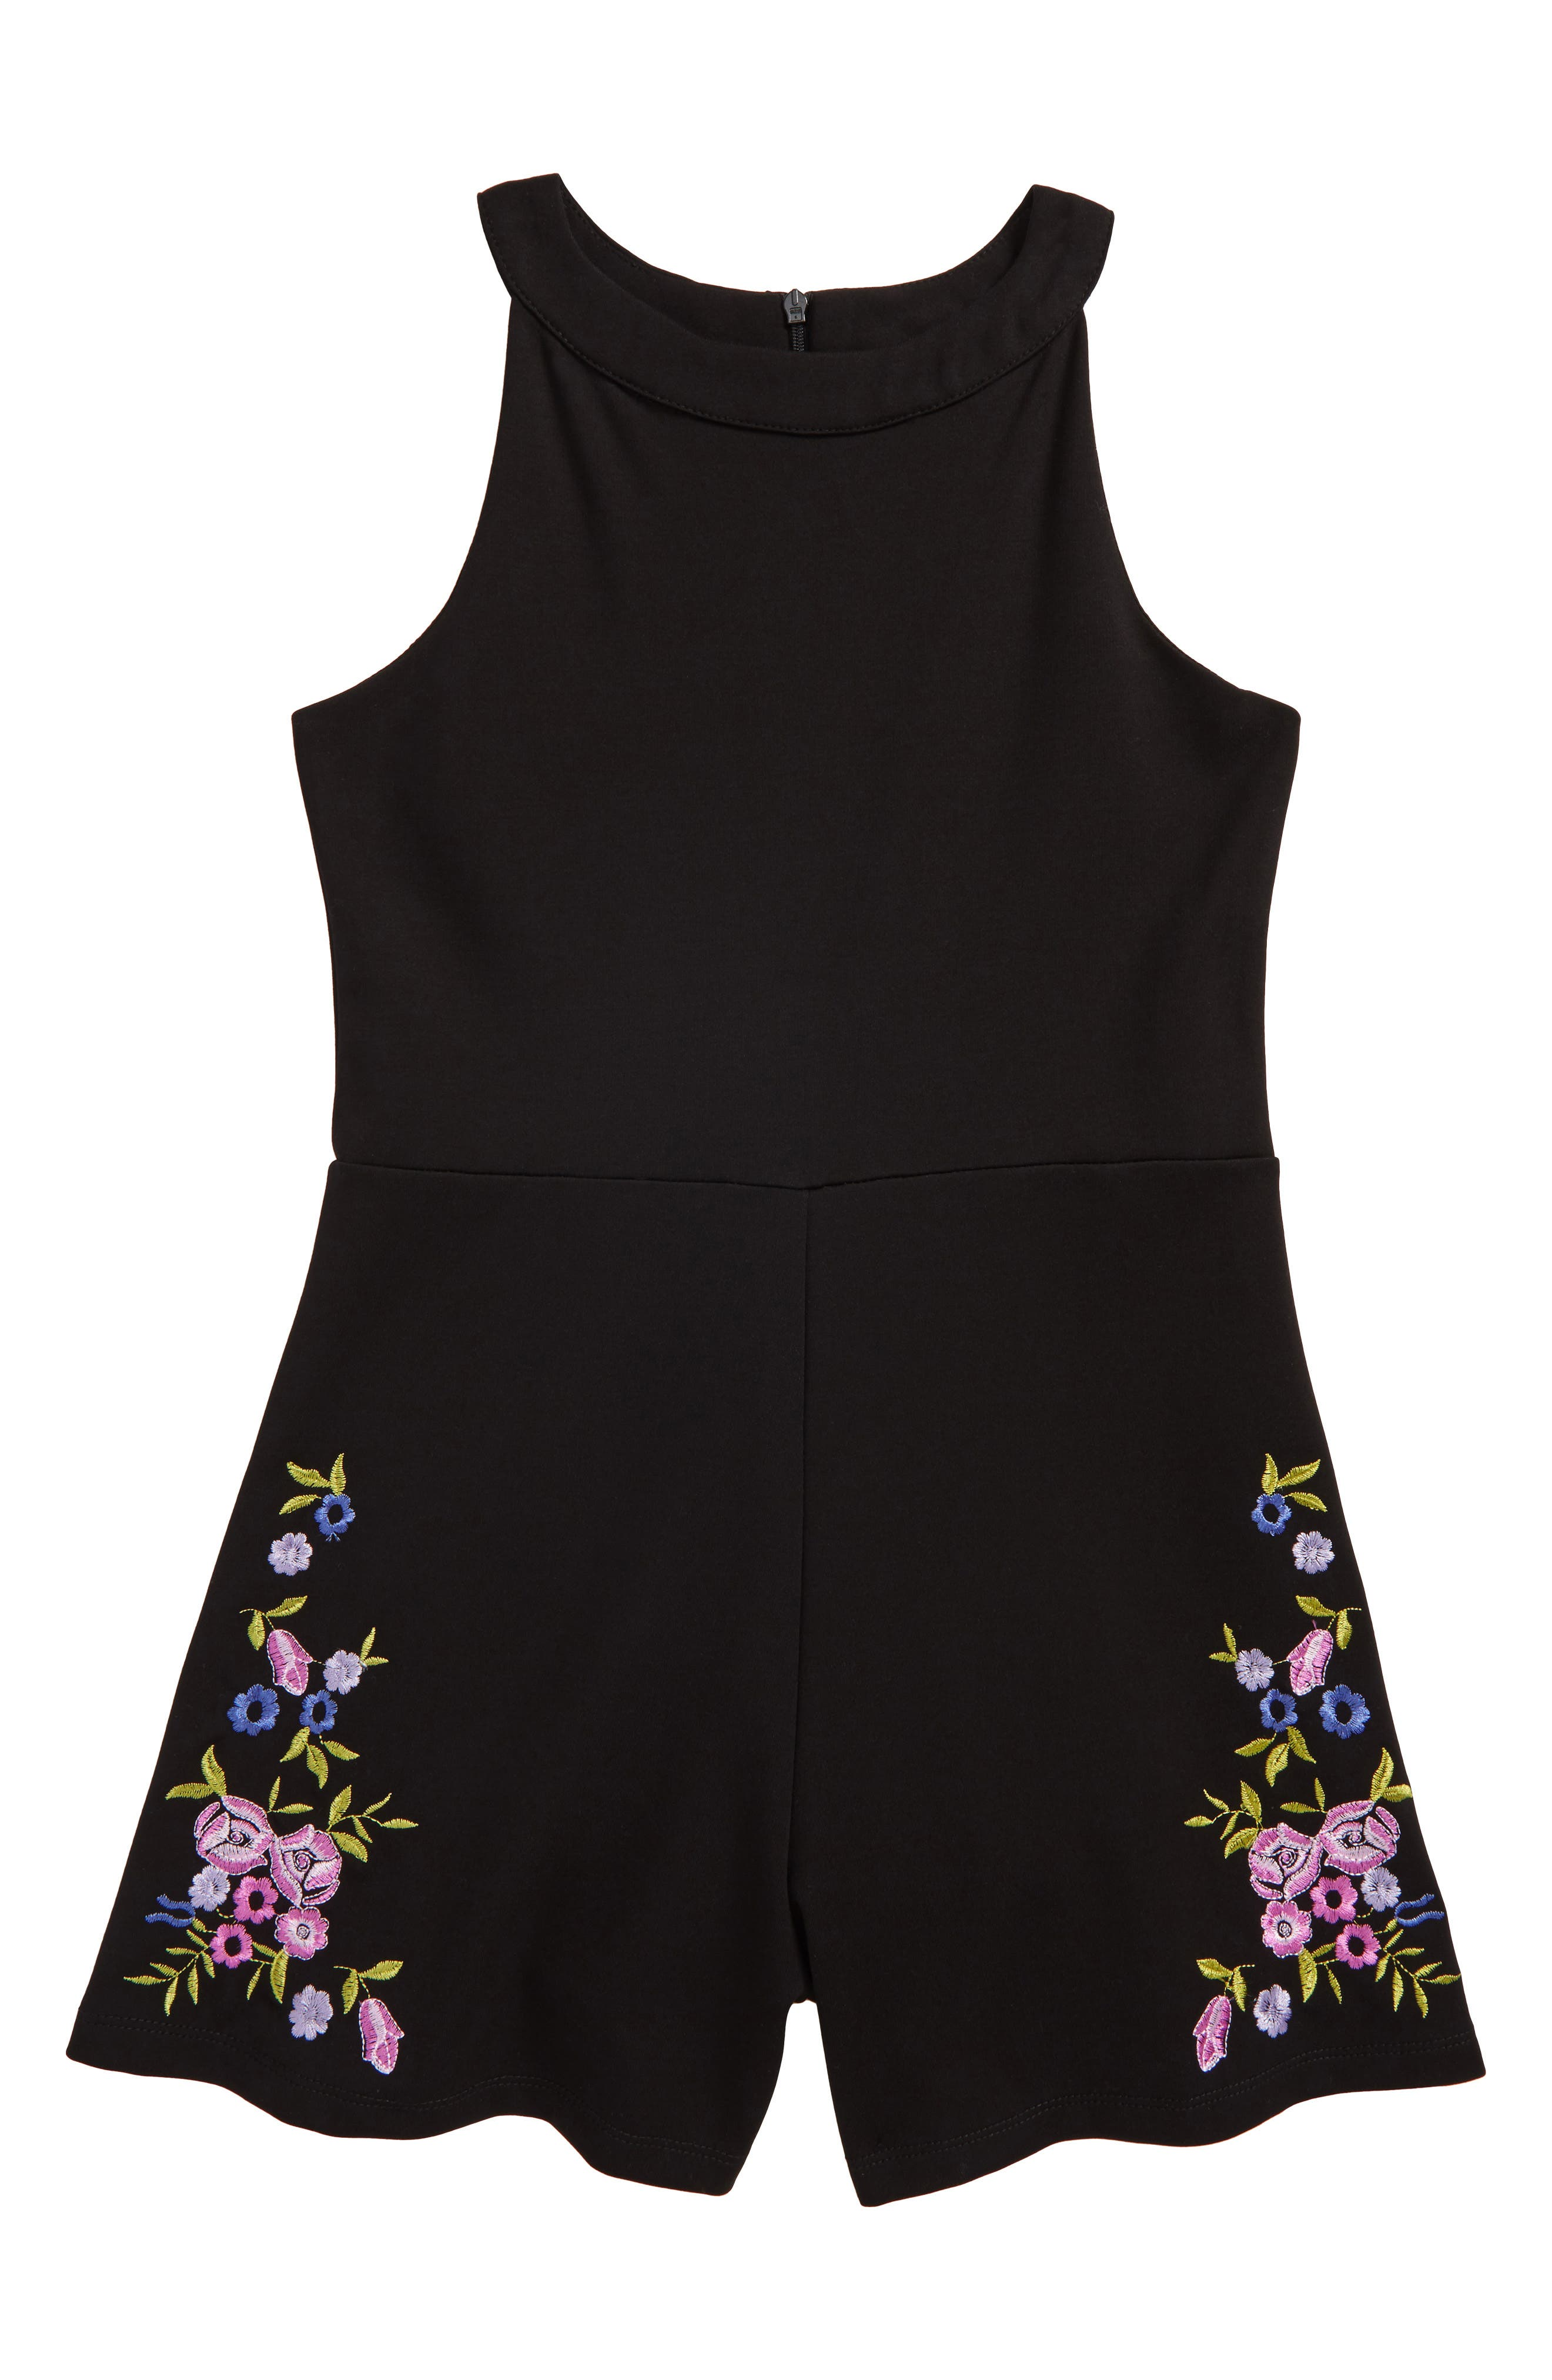 Embroidered Romper,                         Main,                         color, Black